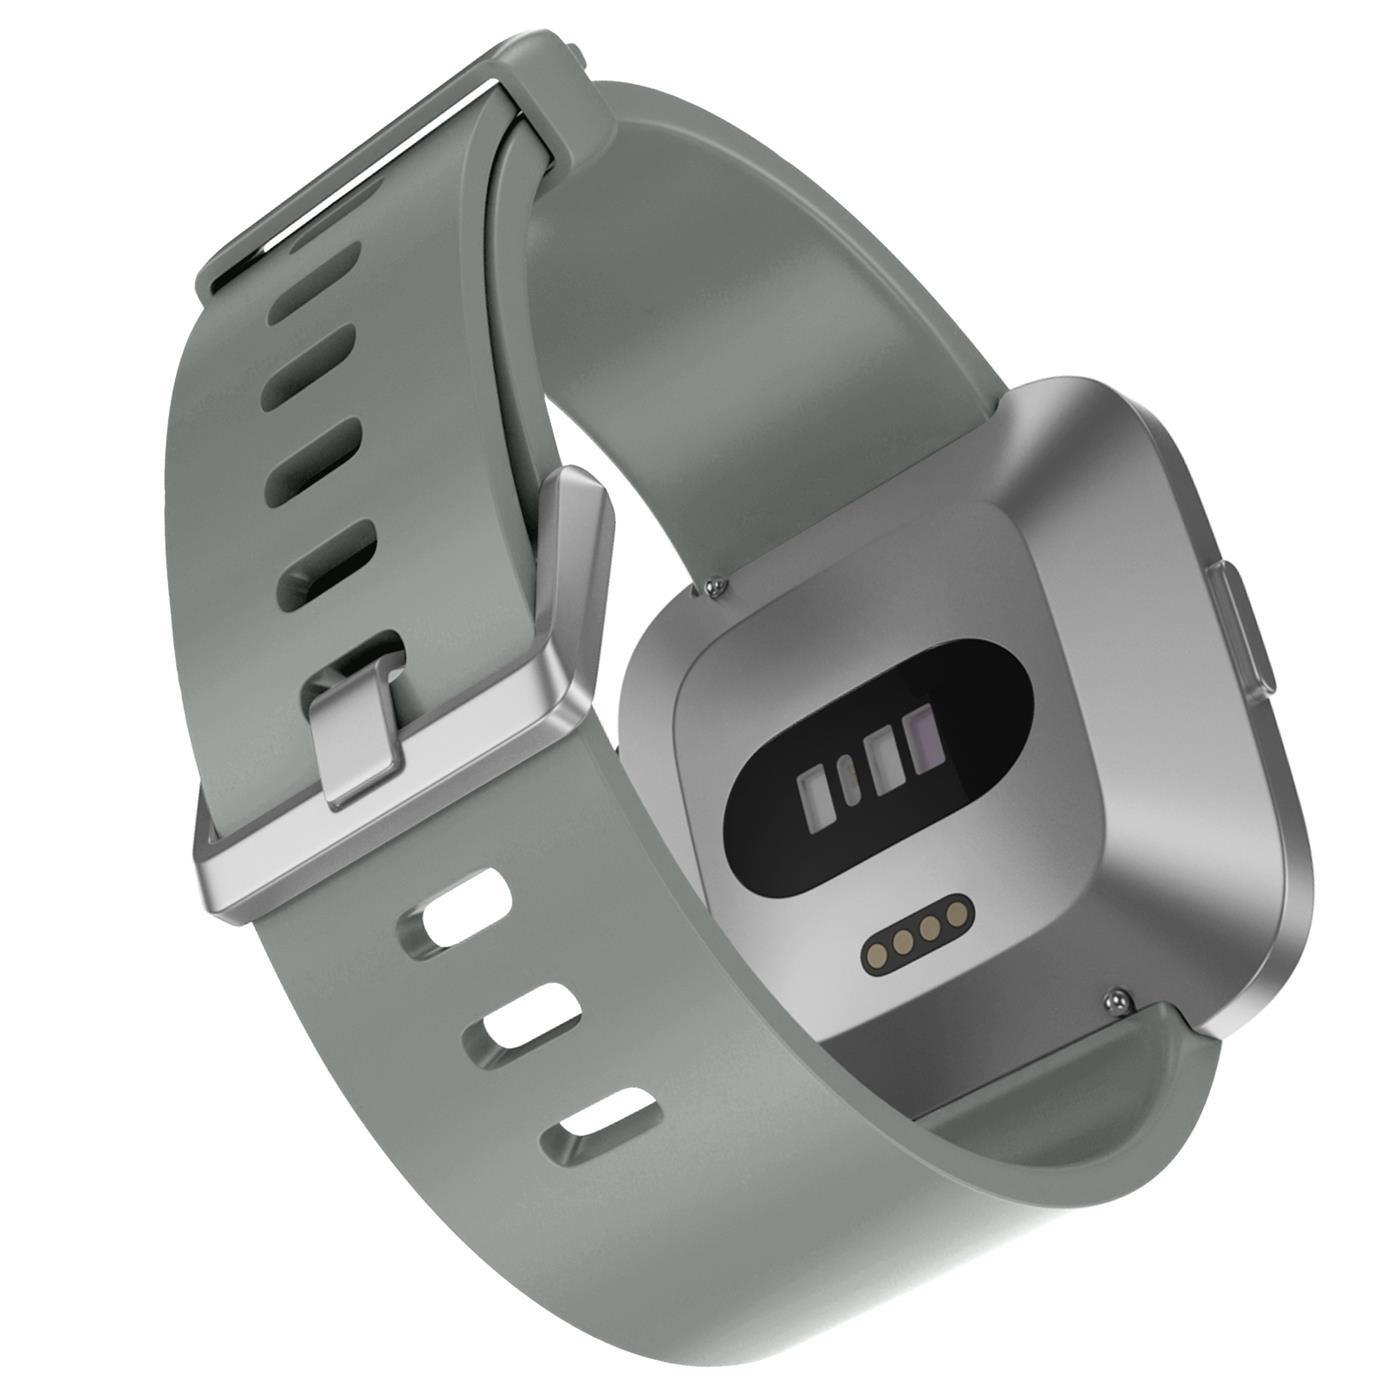 Fitbit-Groesse-S-oder-L-Ersatz-Silikon-Armband-Uhren-Sport-Band-Fitness-Tracker Indexbild 34